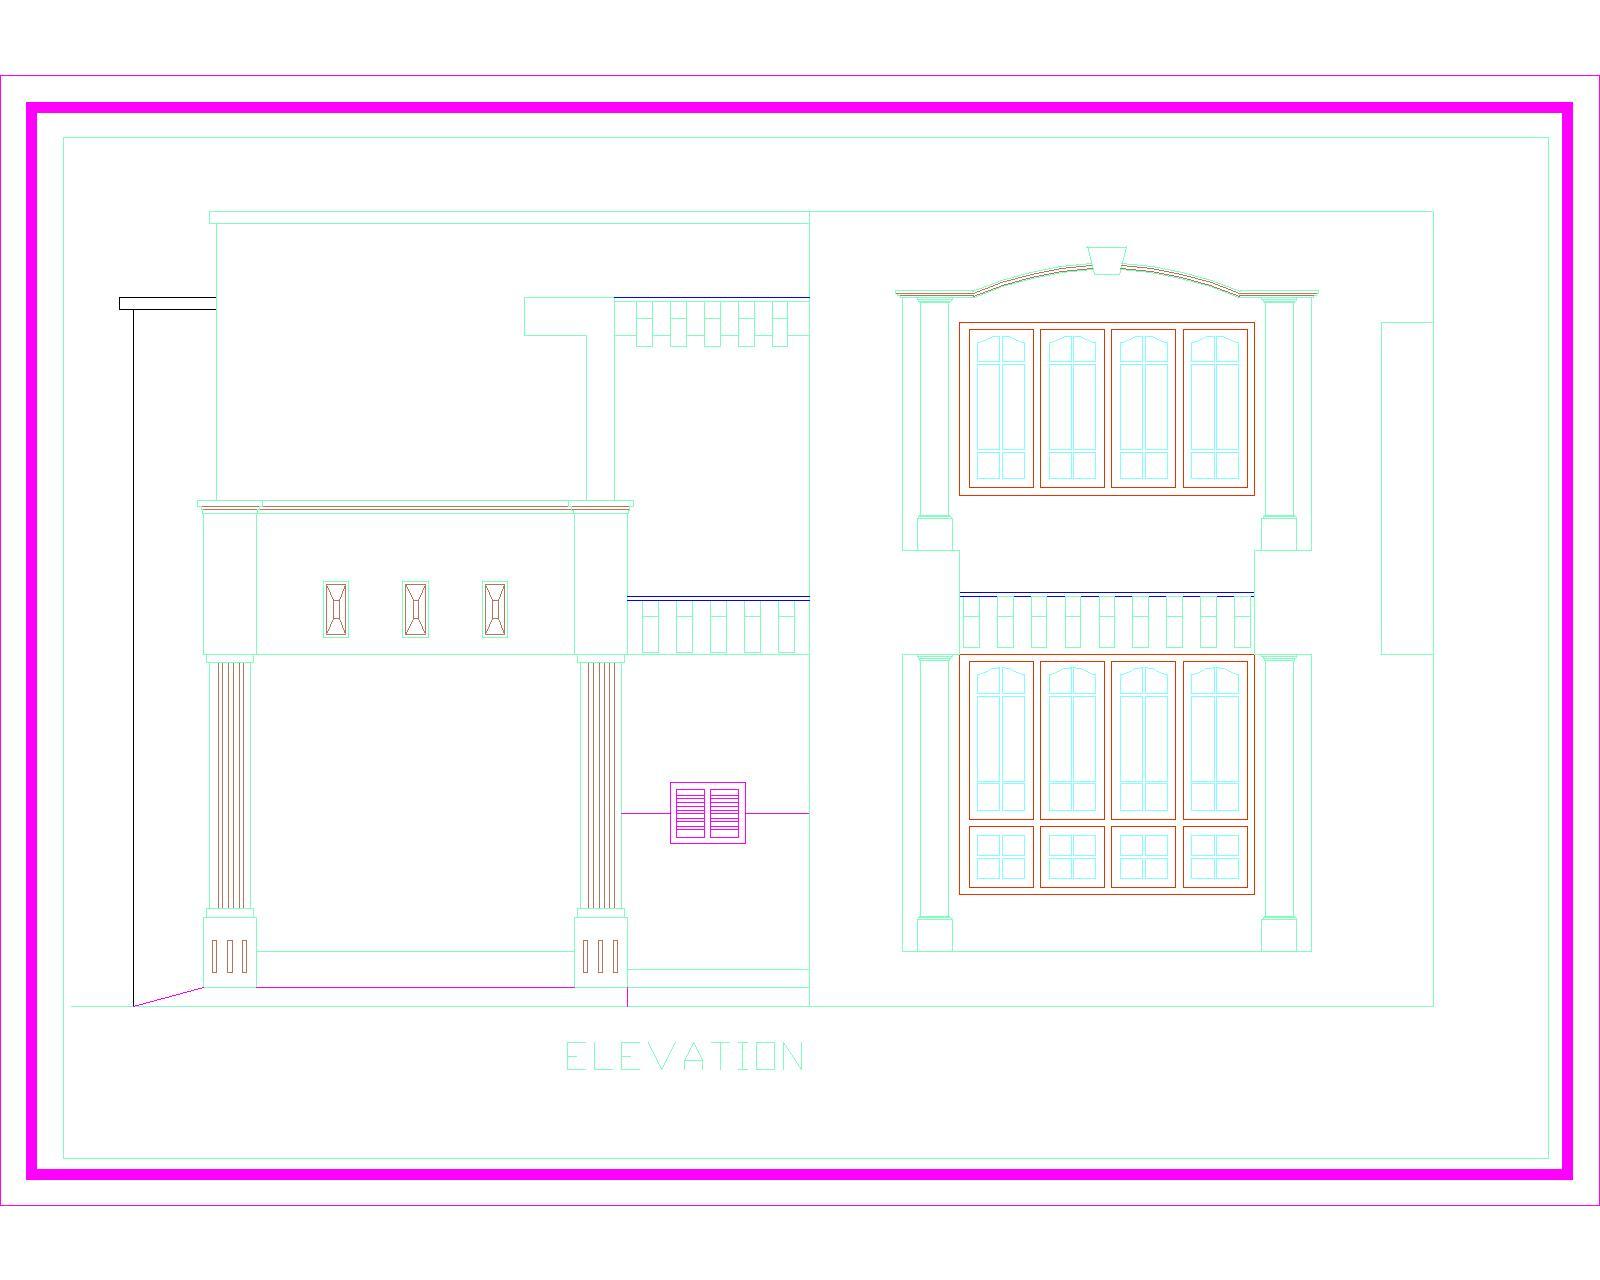 Kerala veedu plan joy studio design gallery best design for Veedu plans at kerala model